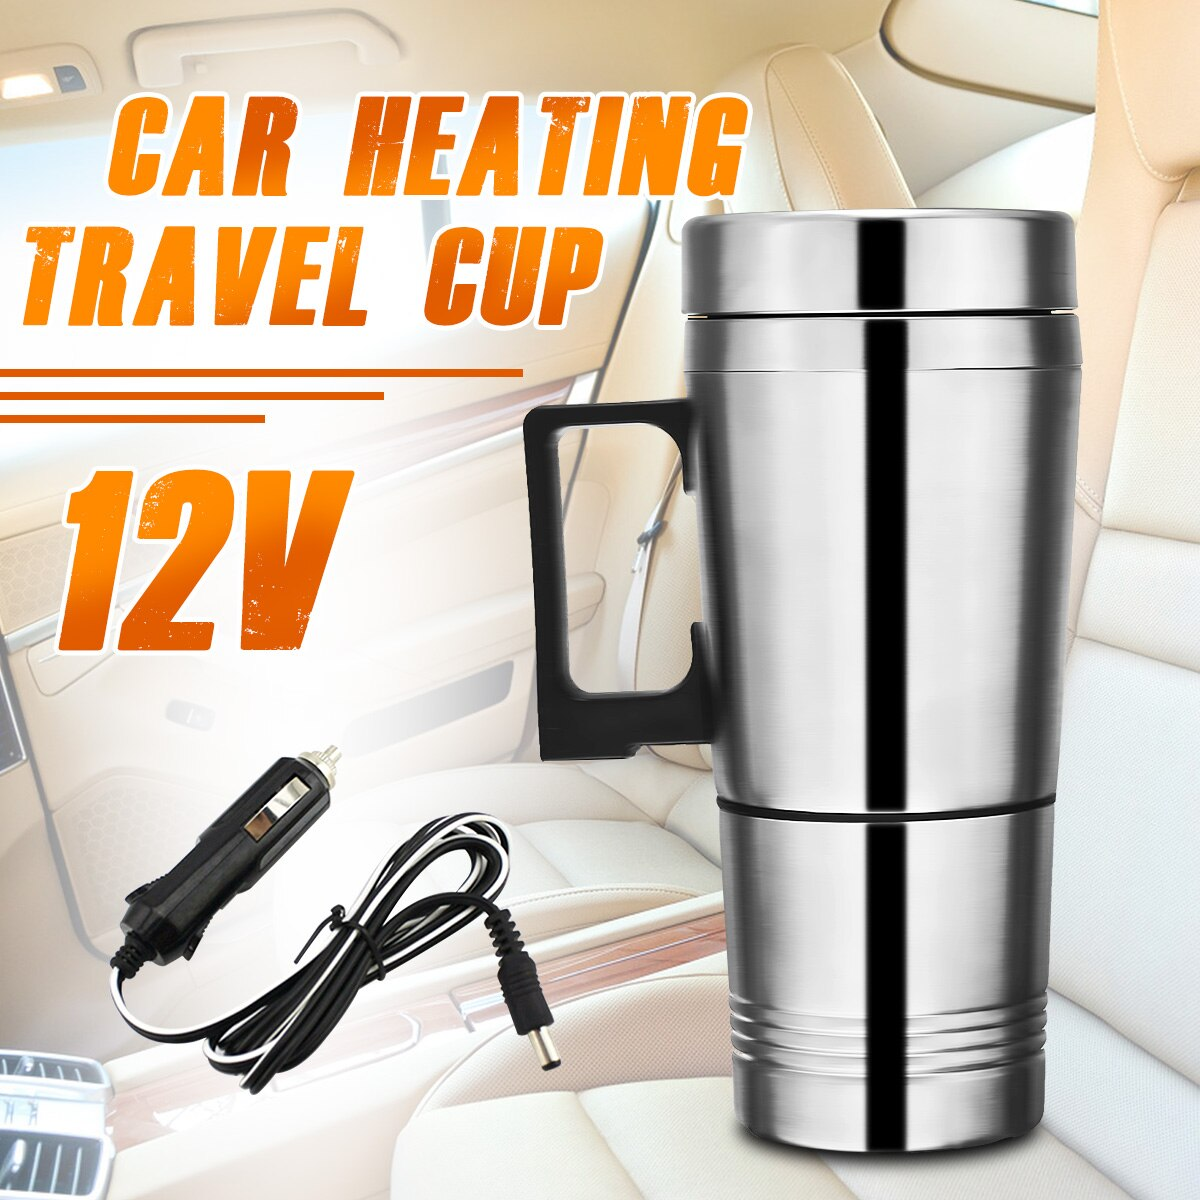 Cafetera portátil de 12v 300ml para coche, tetera para vehículo, tapa de taza calefactora, termos de vacío para botella de agua de viaje al aire libre